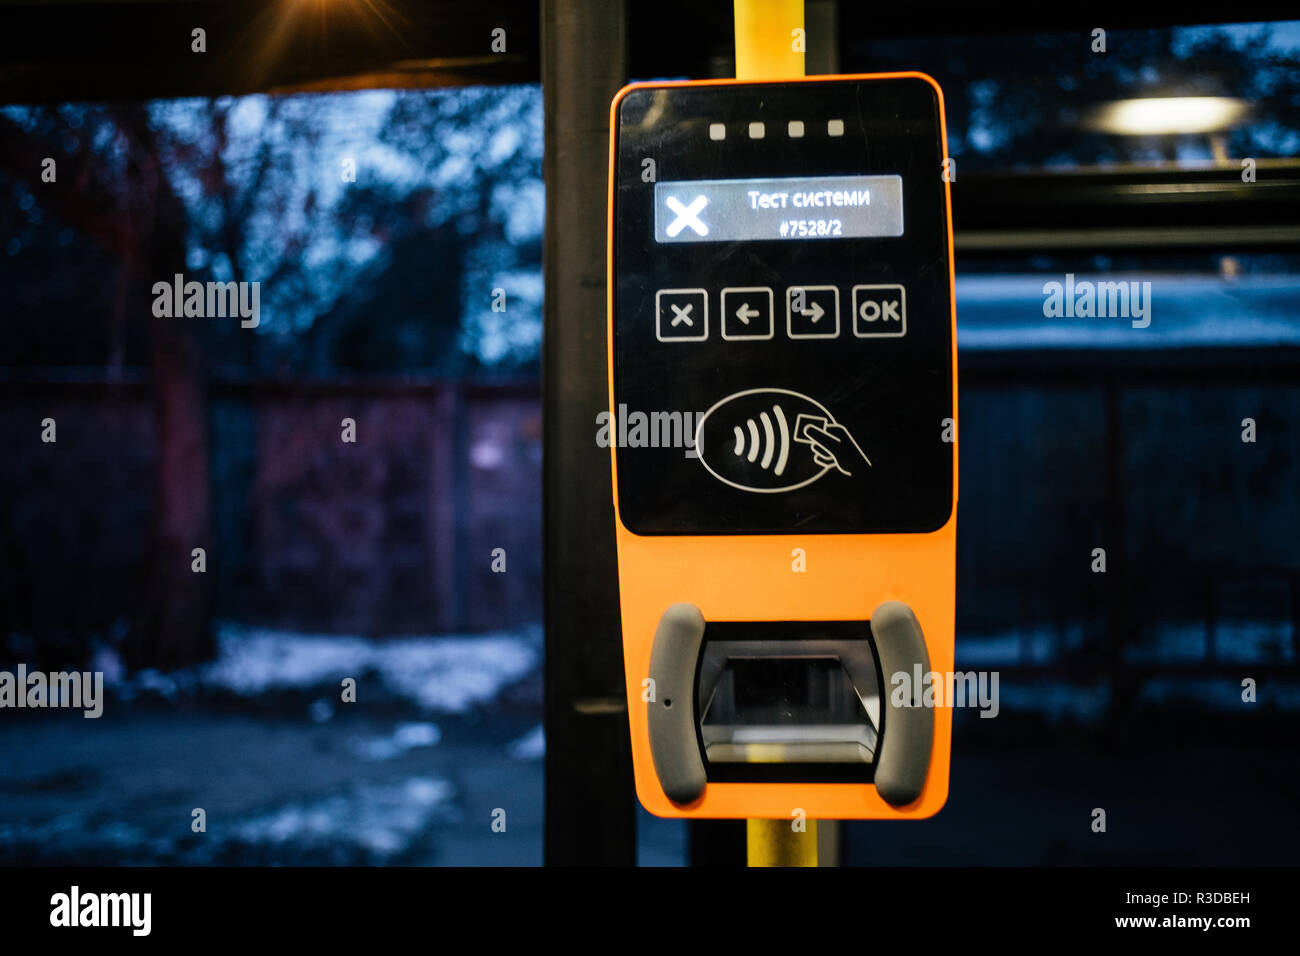 Modern bus punch validator close up in Kyiv, Ukraine - Stock Image